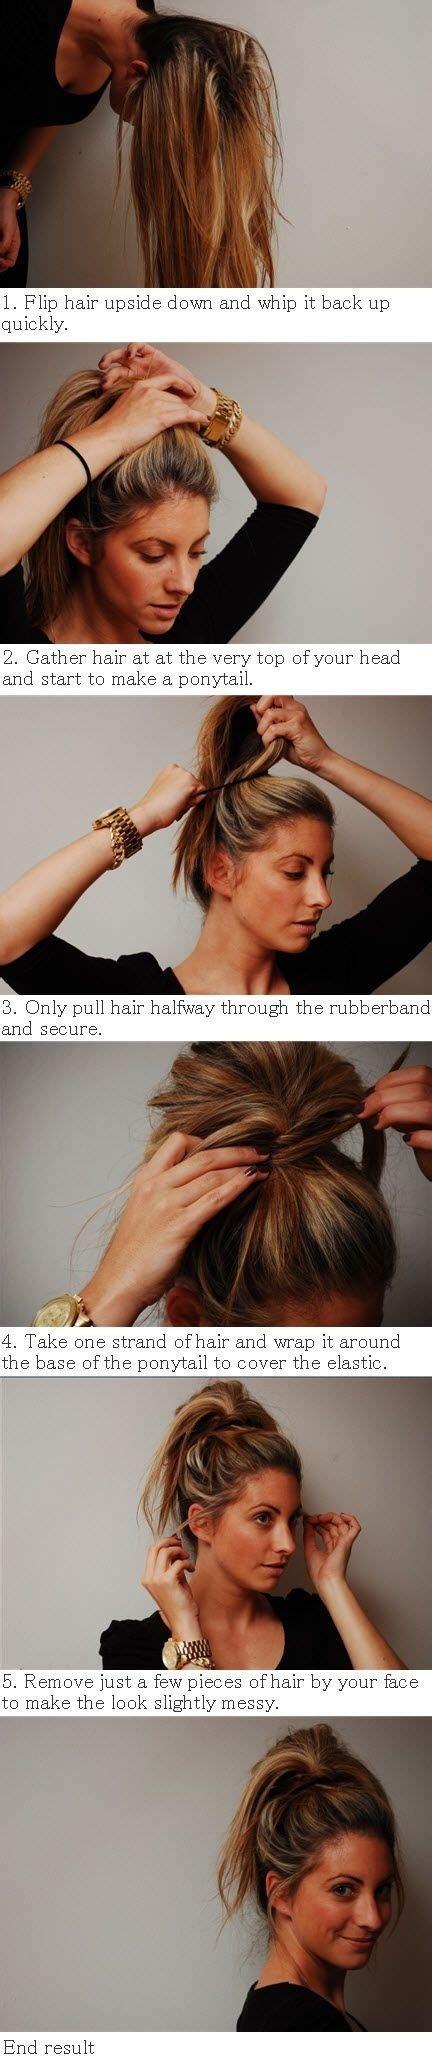 Diy Messy Bun Ponytail Hybrid Hairstyle Diy Projects